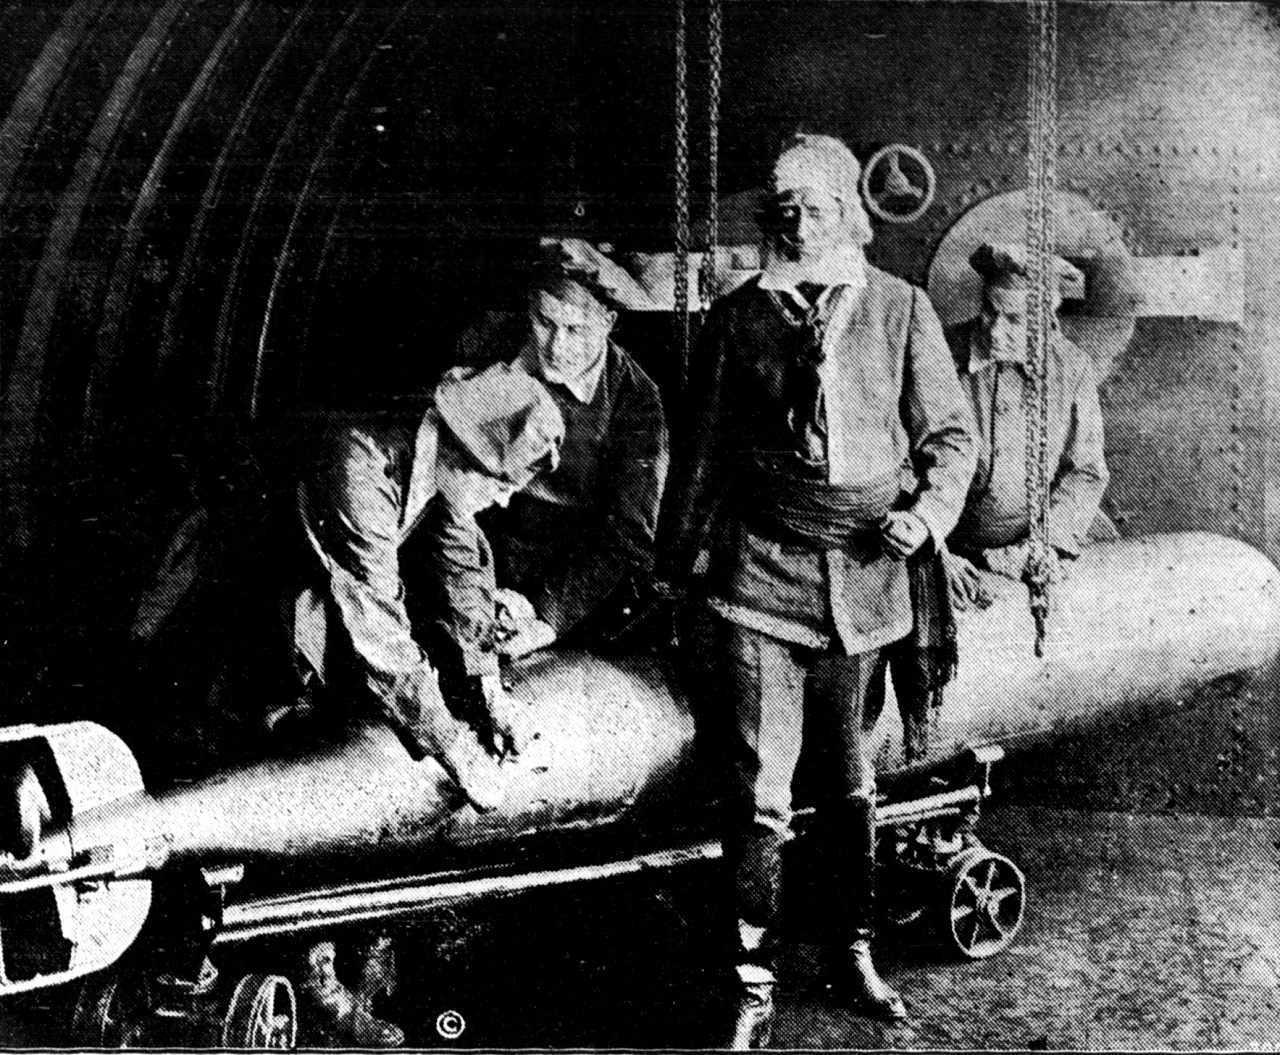 Captain Nemo (Allan Holubar) in Twenty Thousand Leagues Under the Sea (1916)